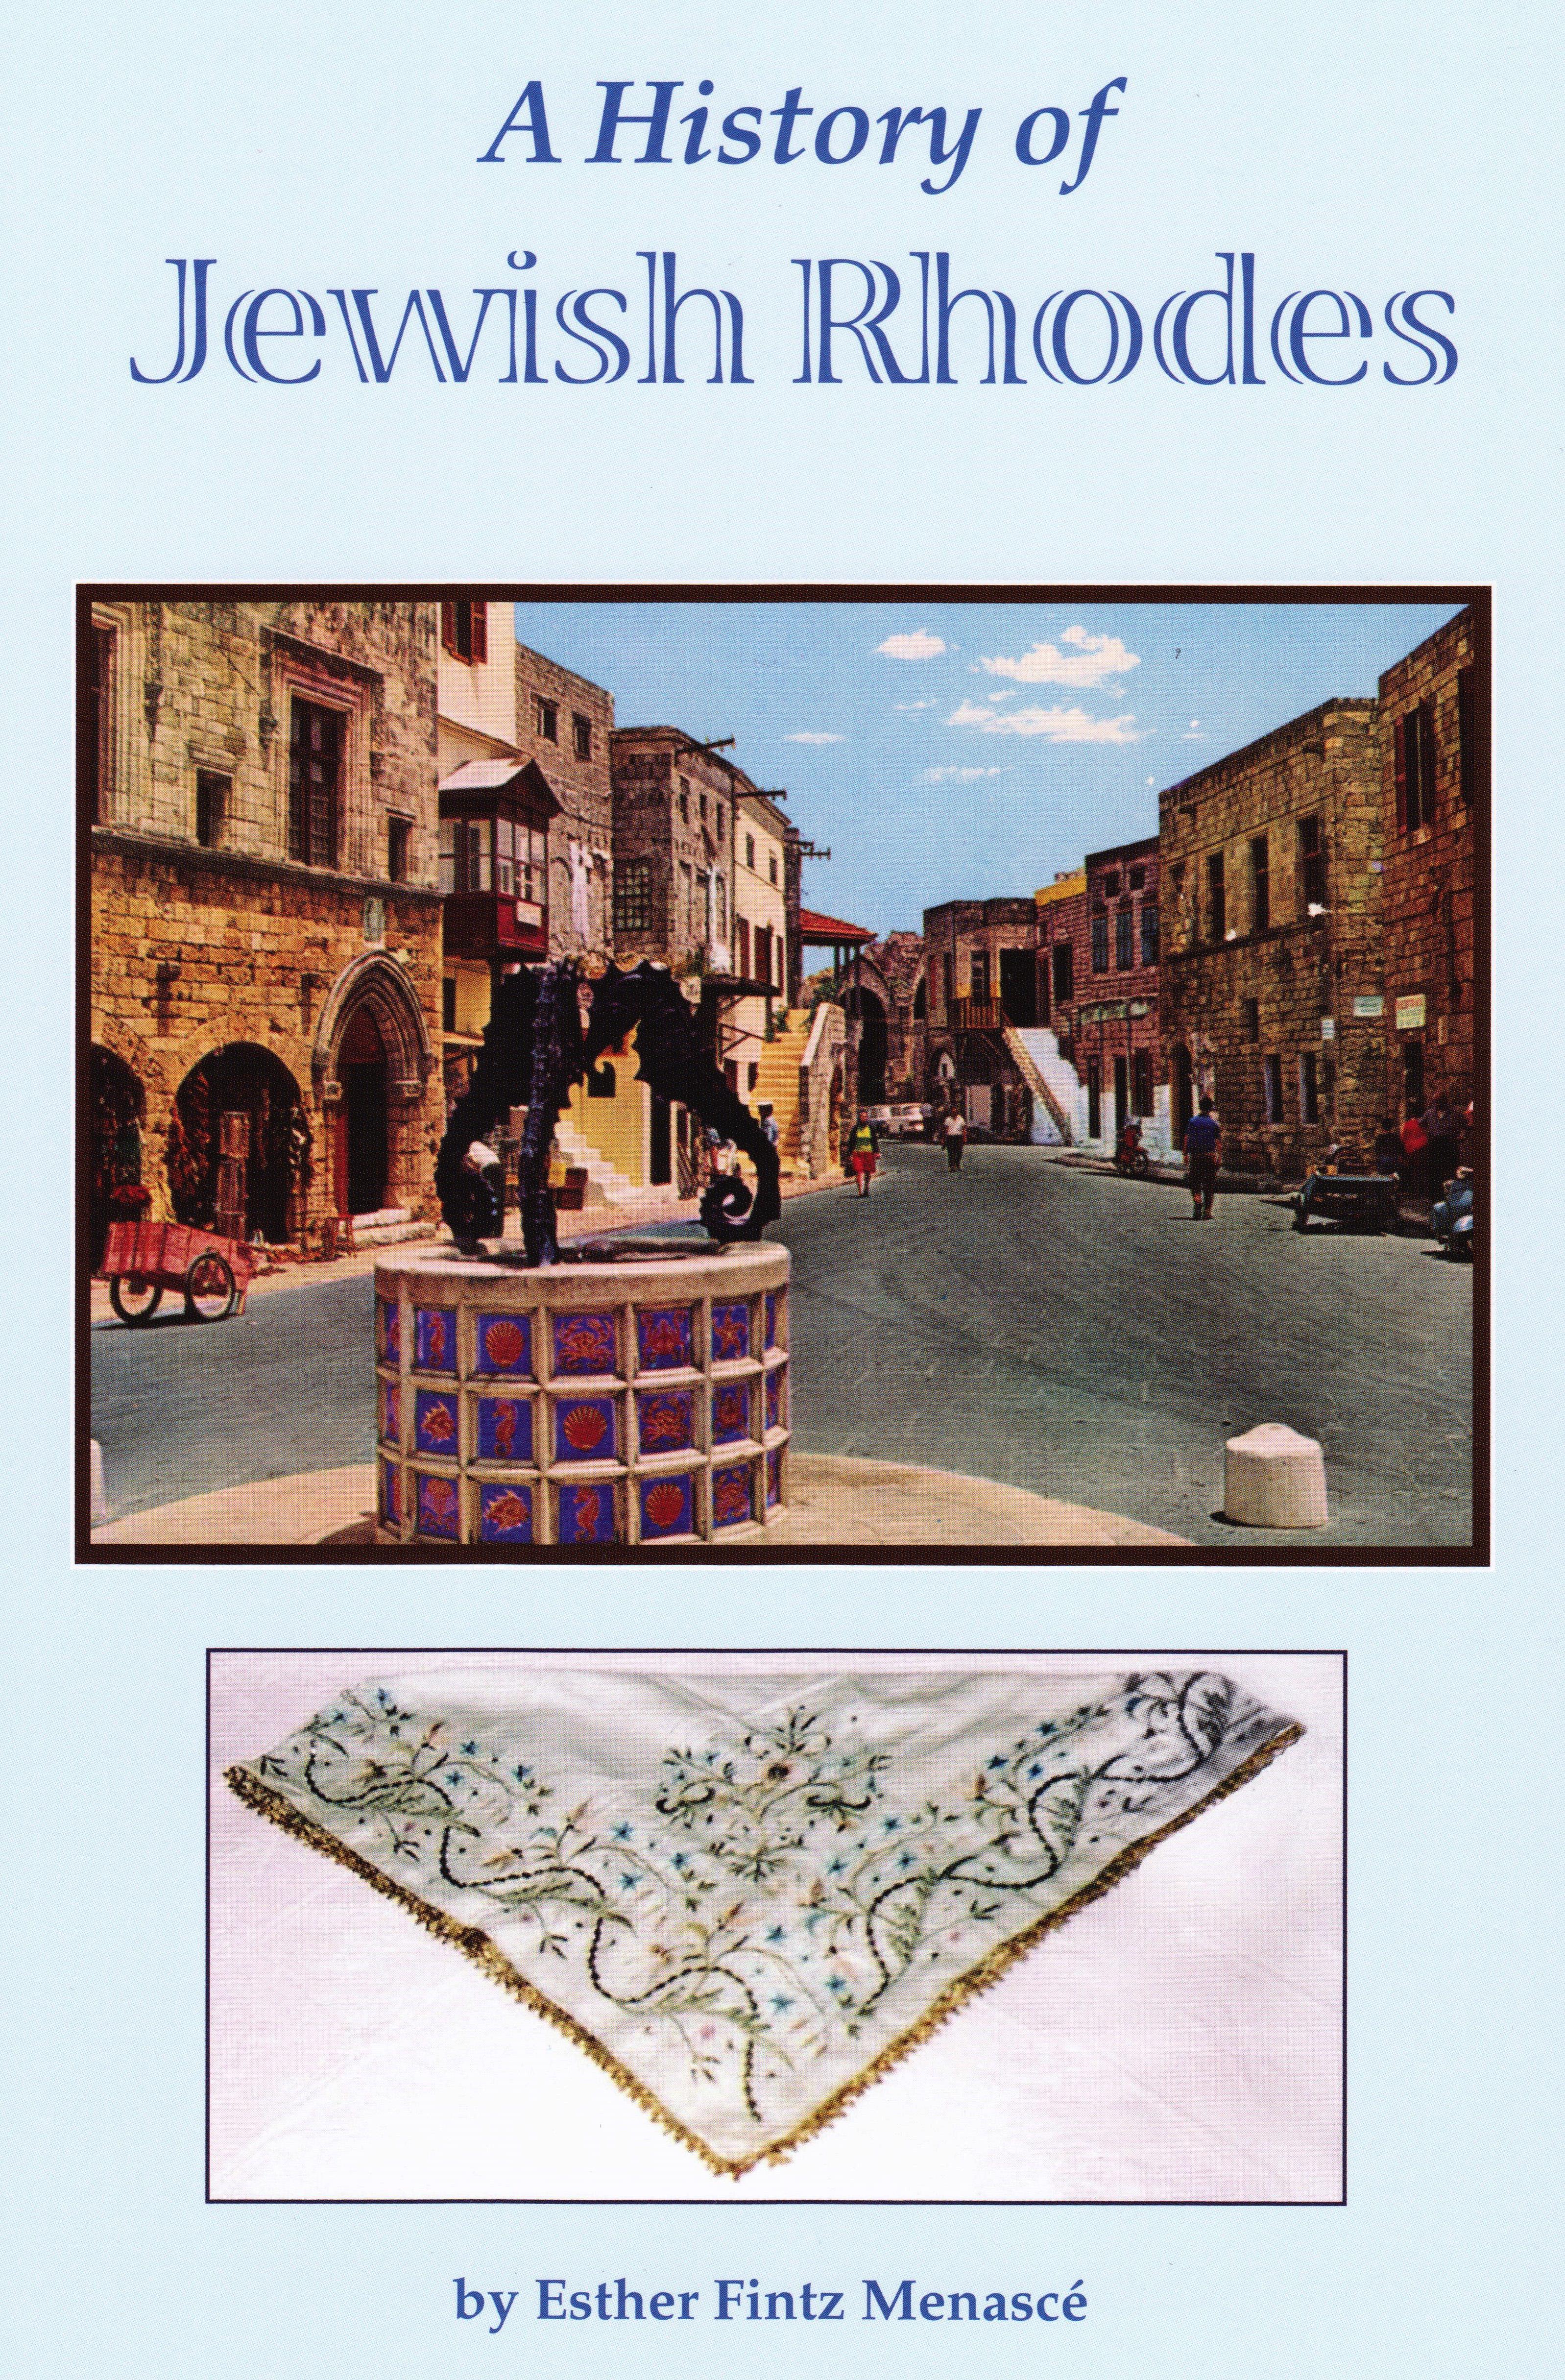 A History of Jewish Rhodes